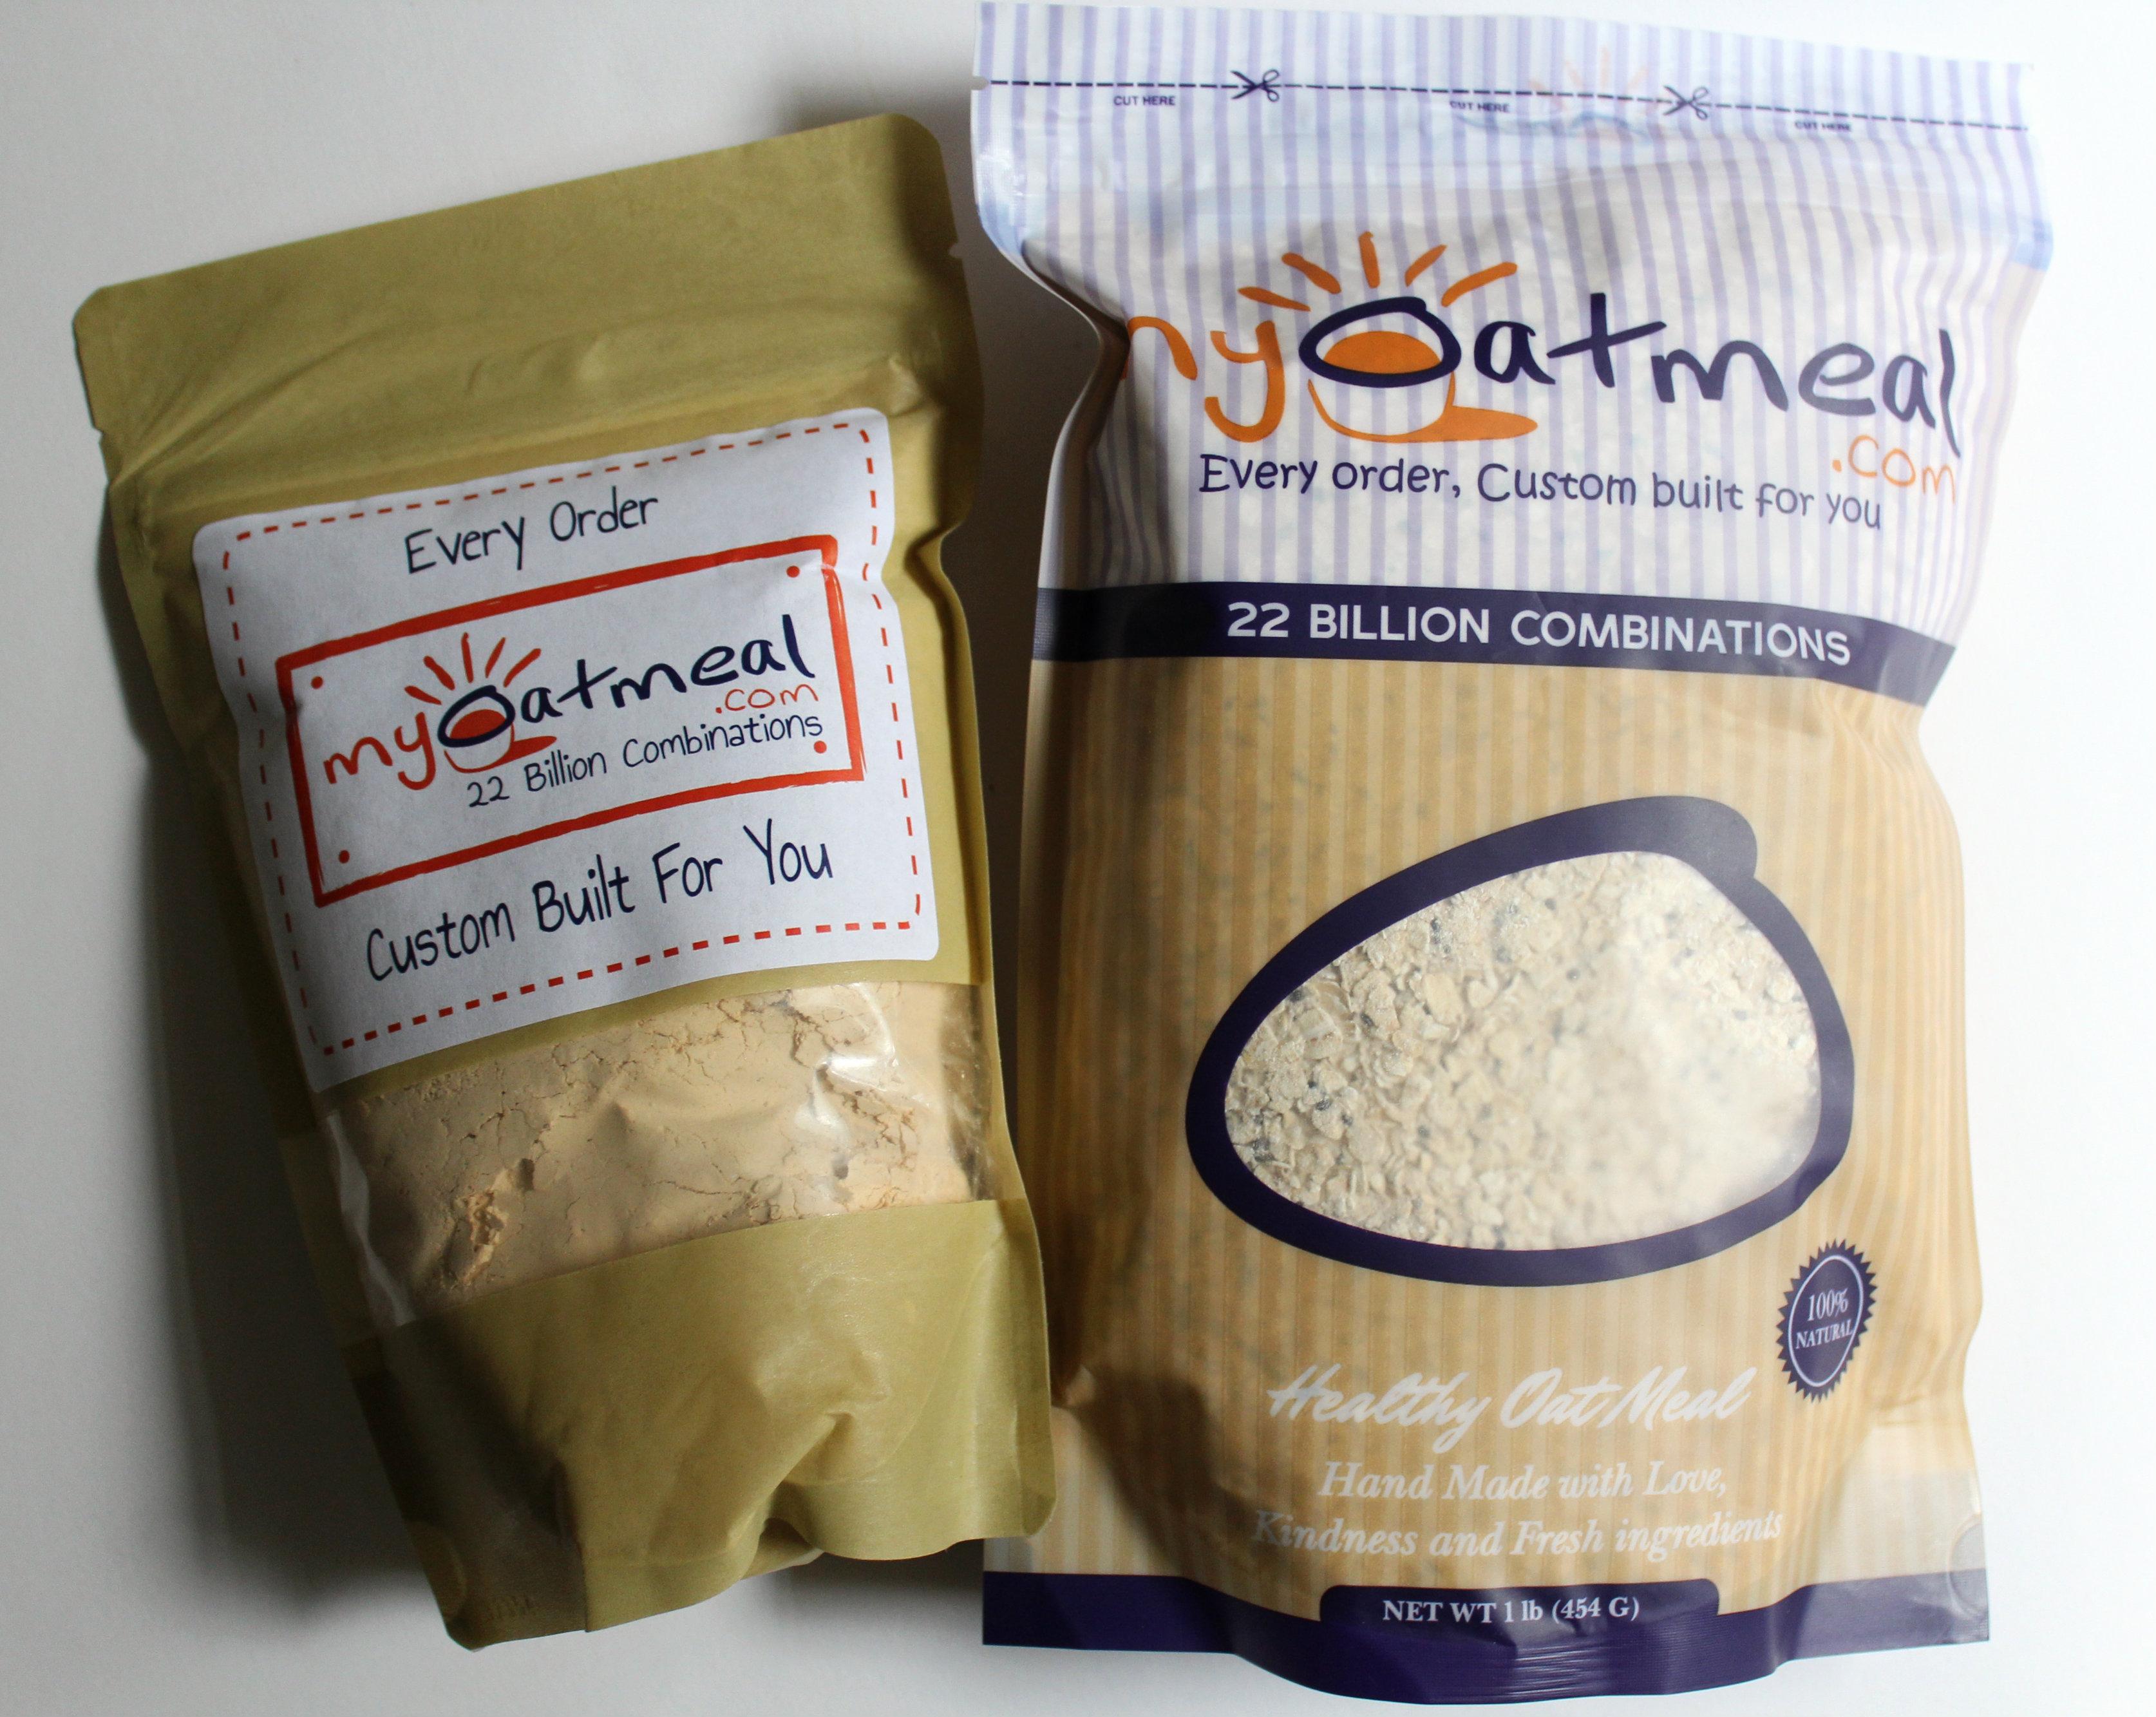 MyOatmeal and PB Lean | Strength and Sunshine